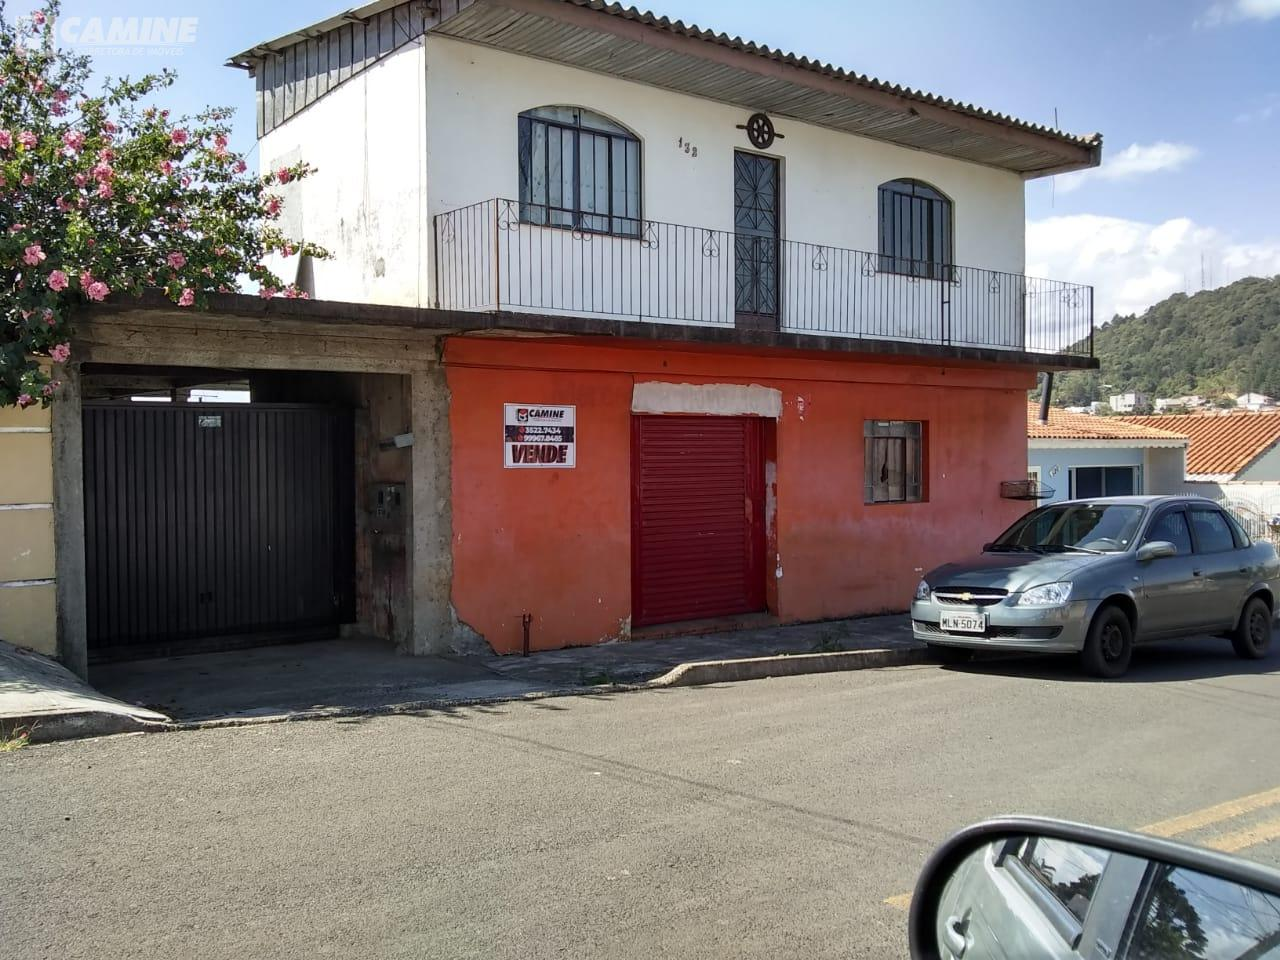 SOBRADO BAIRRO SAO PEDRO - PORTO UNIAO/SC